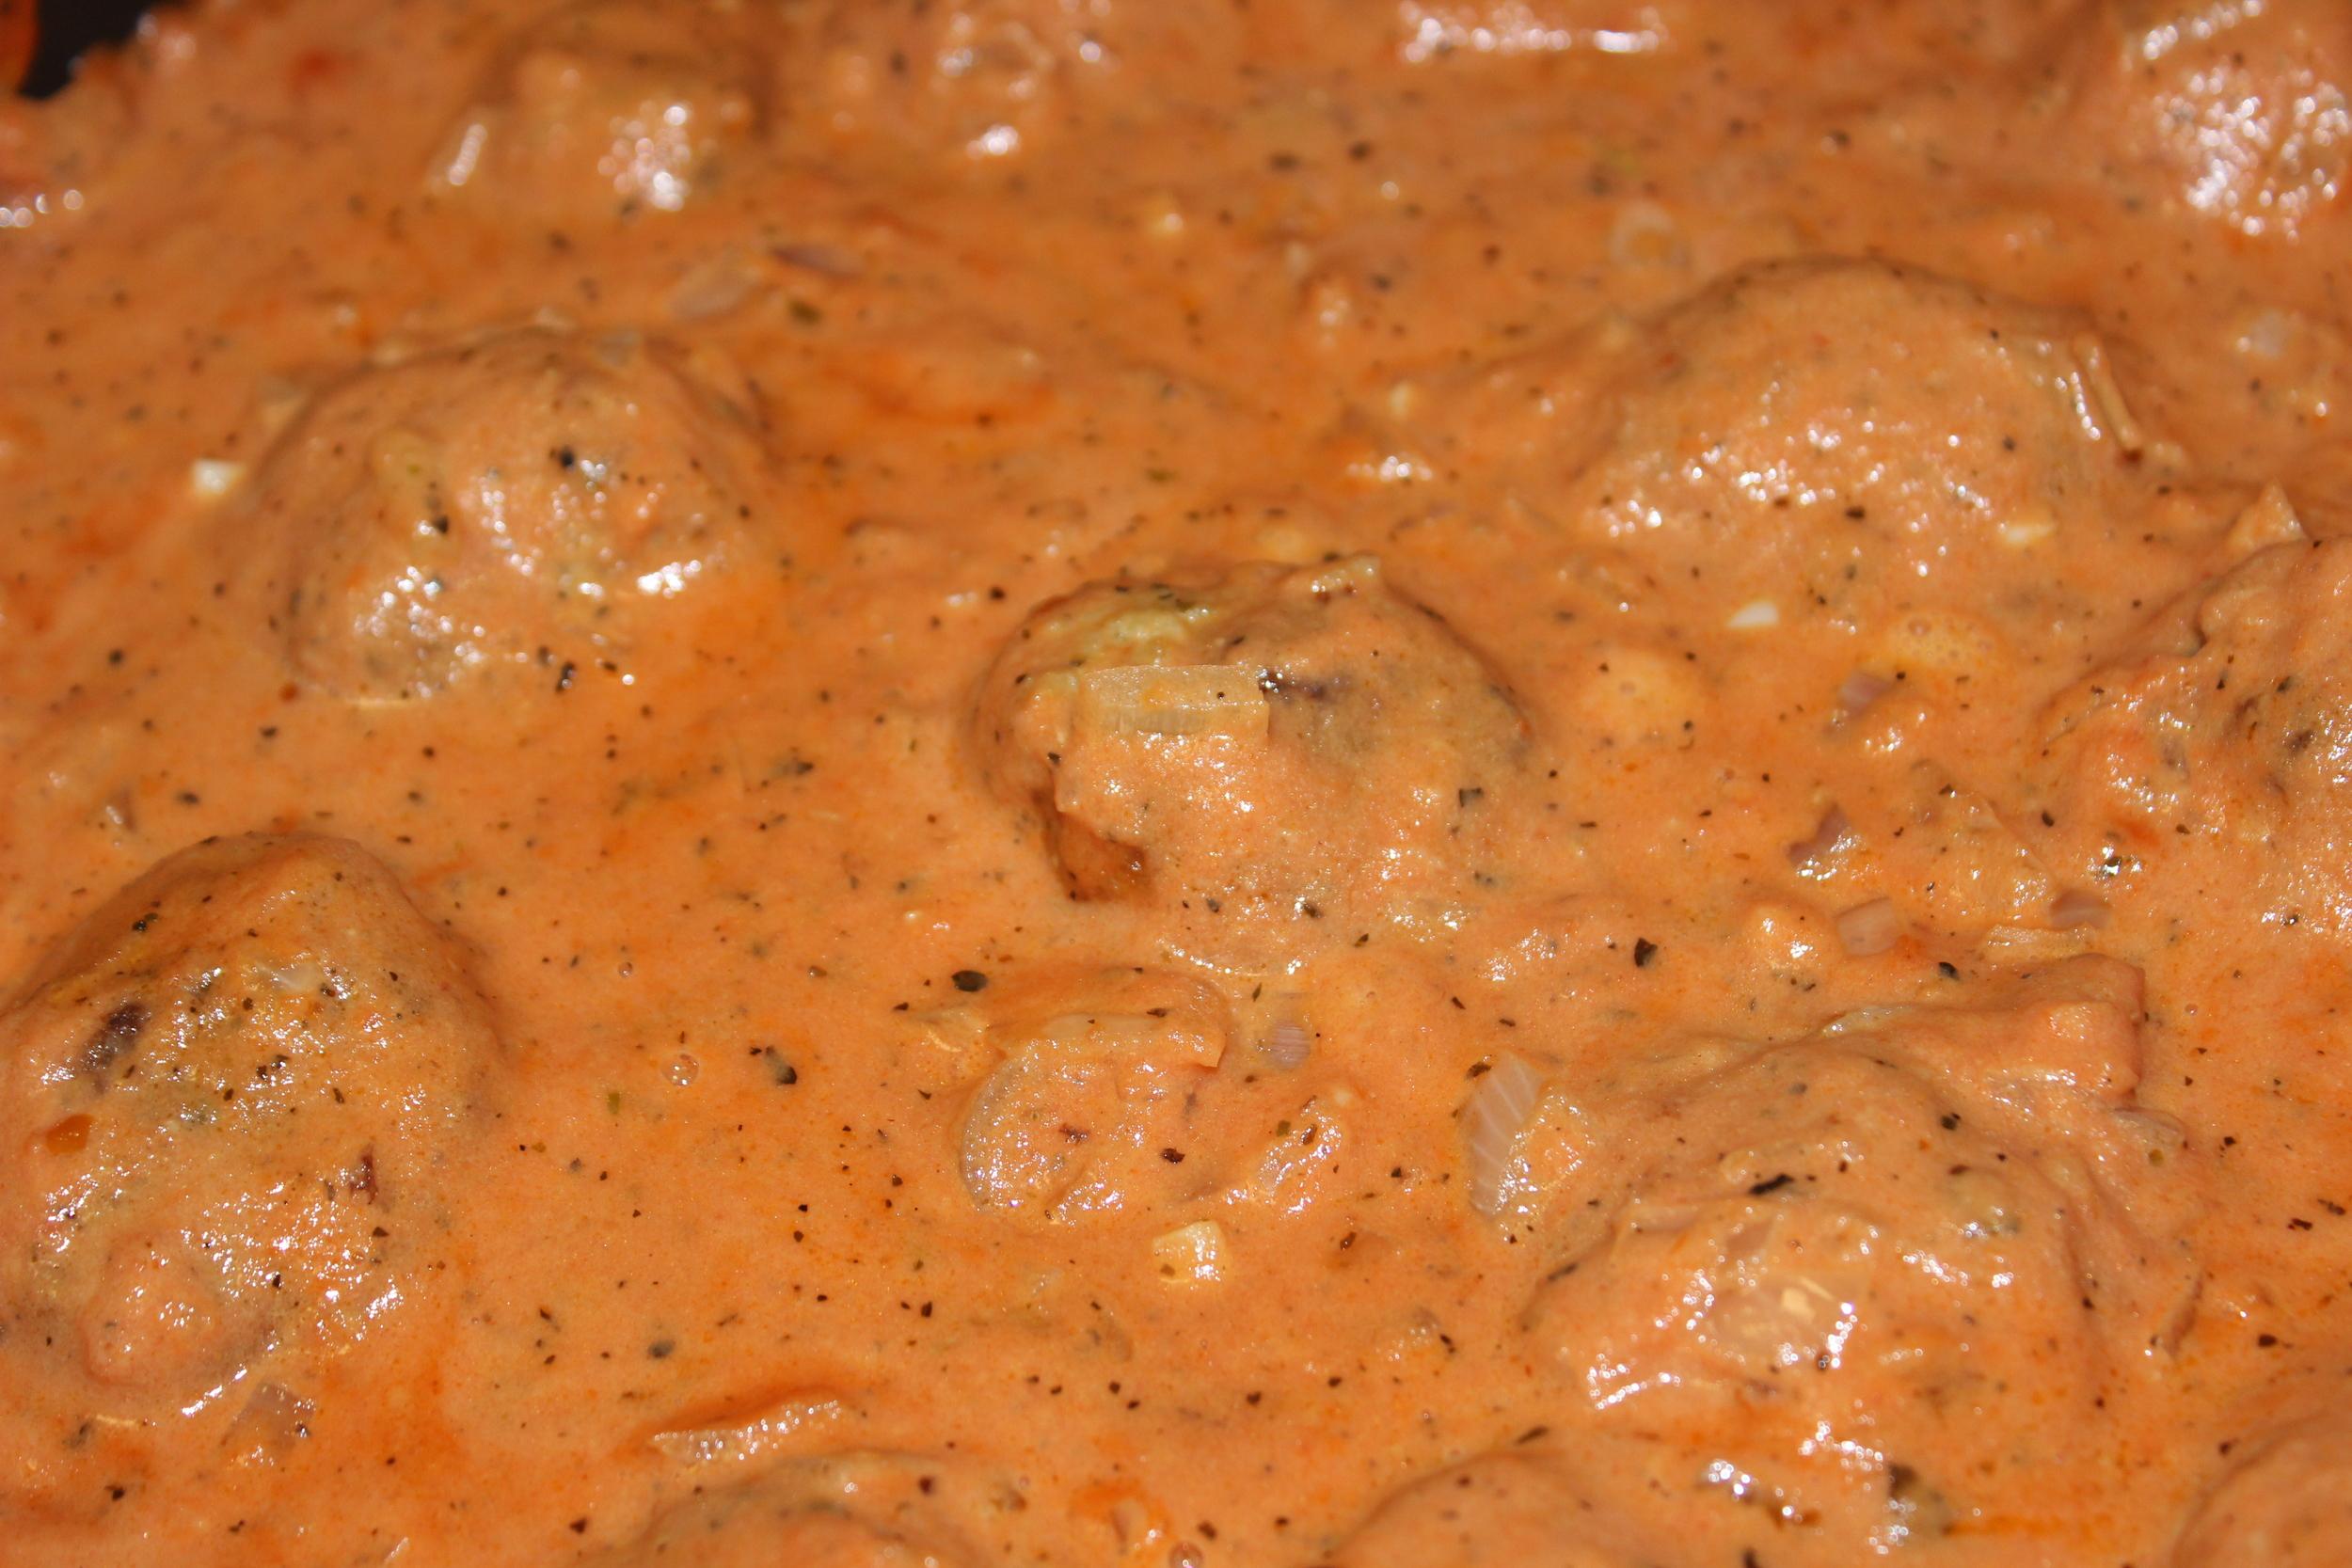 meatballs + sauce = <3